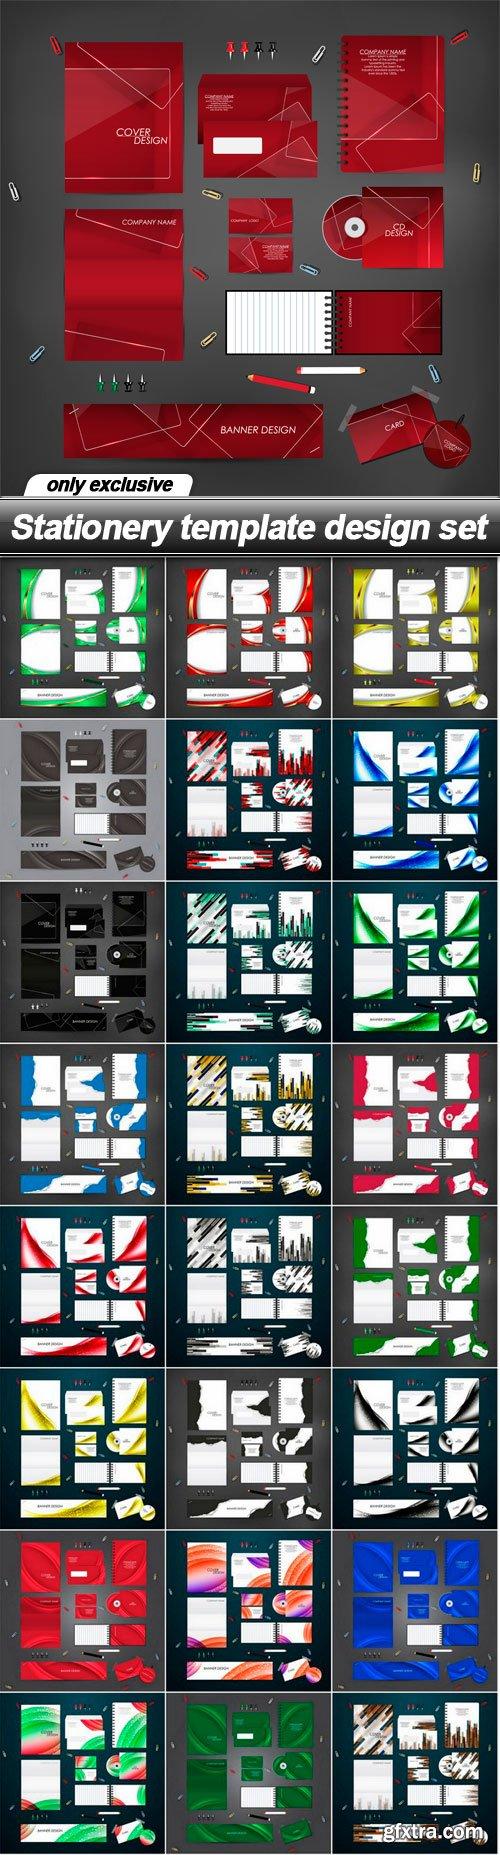 Stationery template design set - 25 EPS